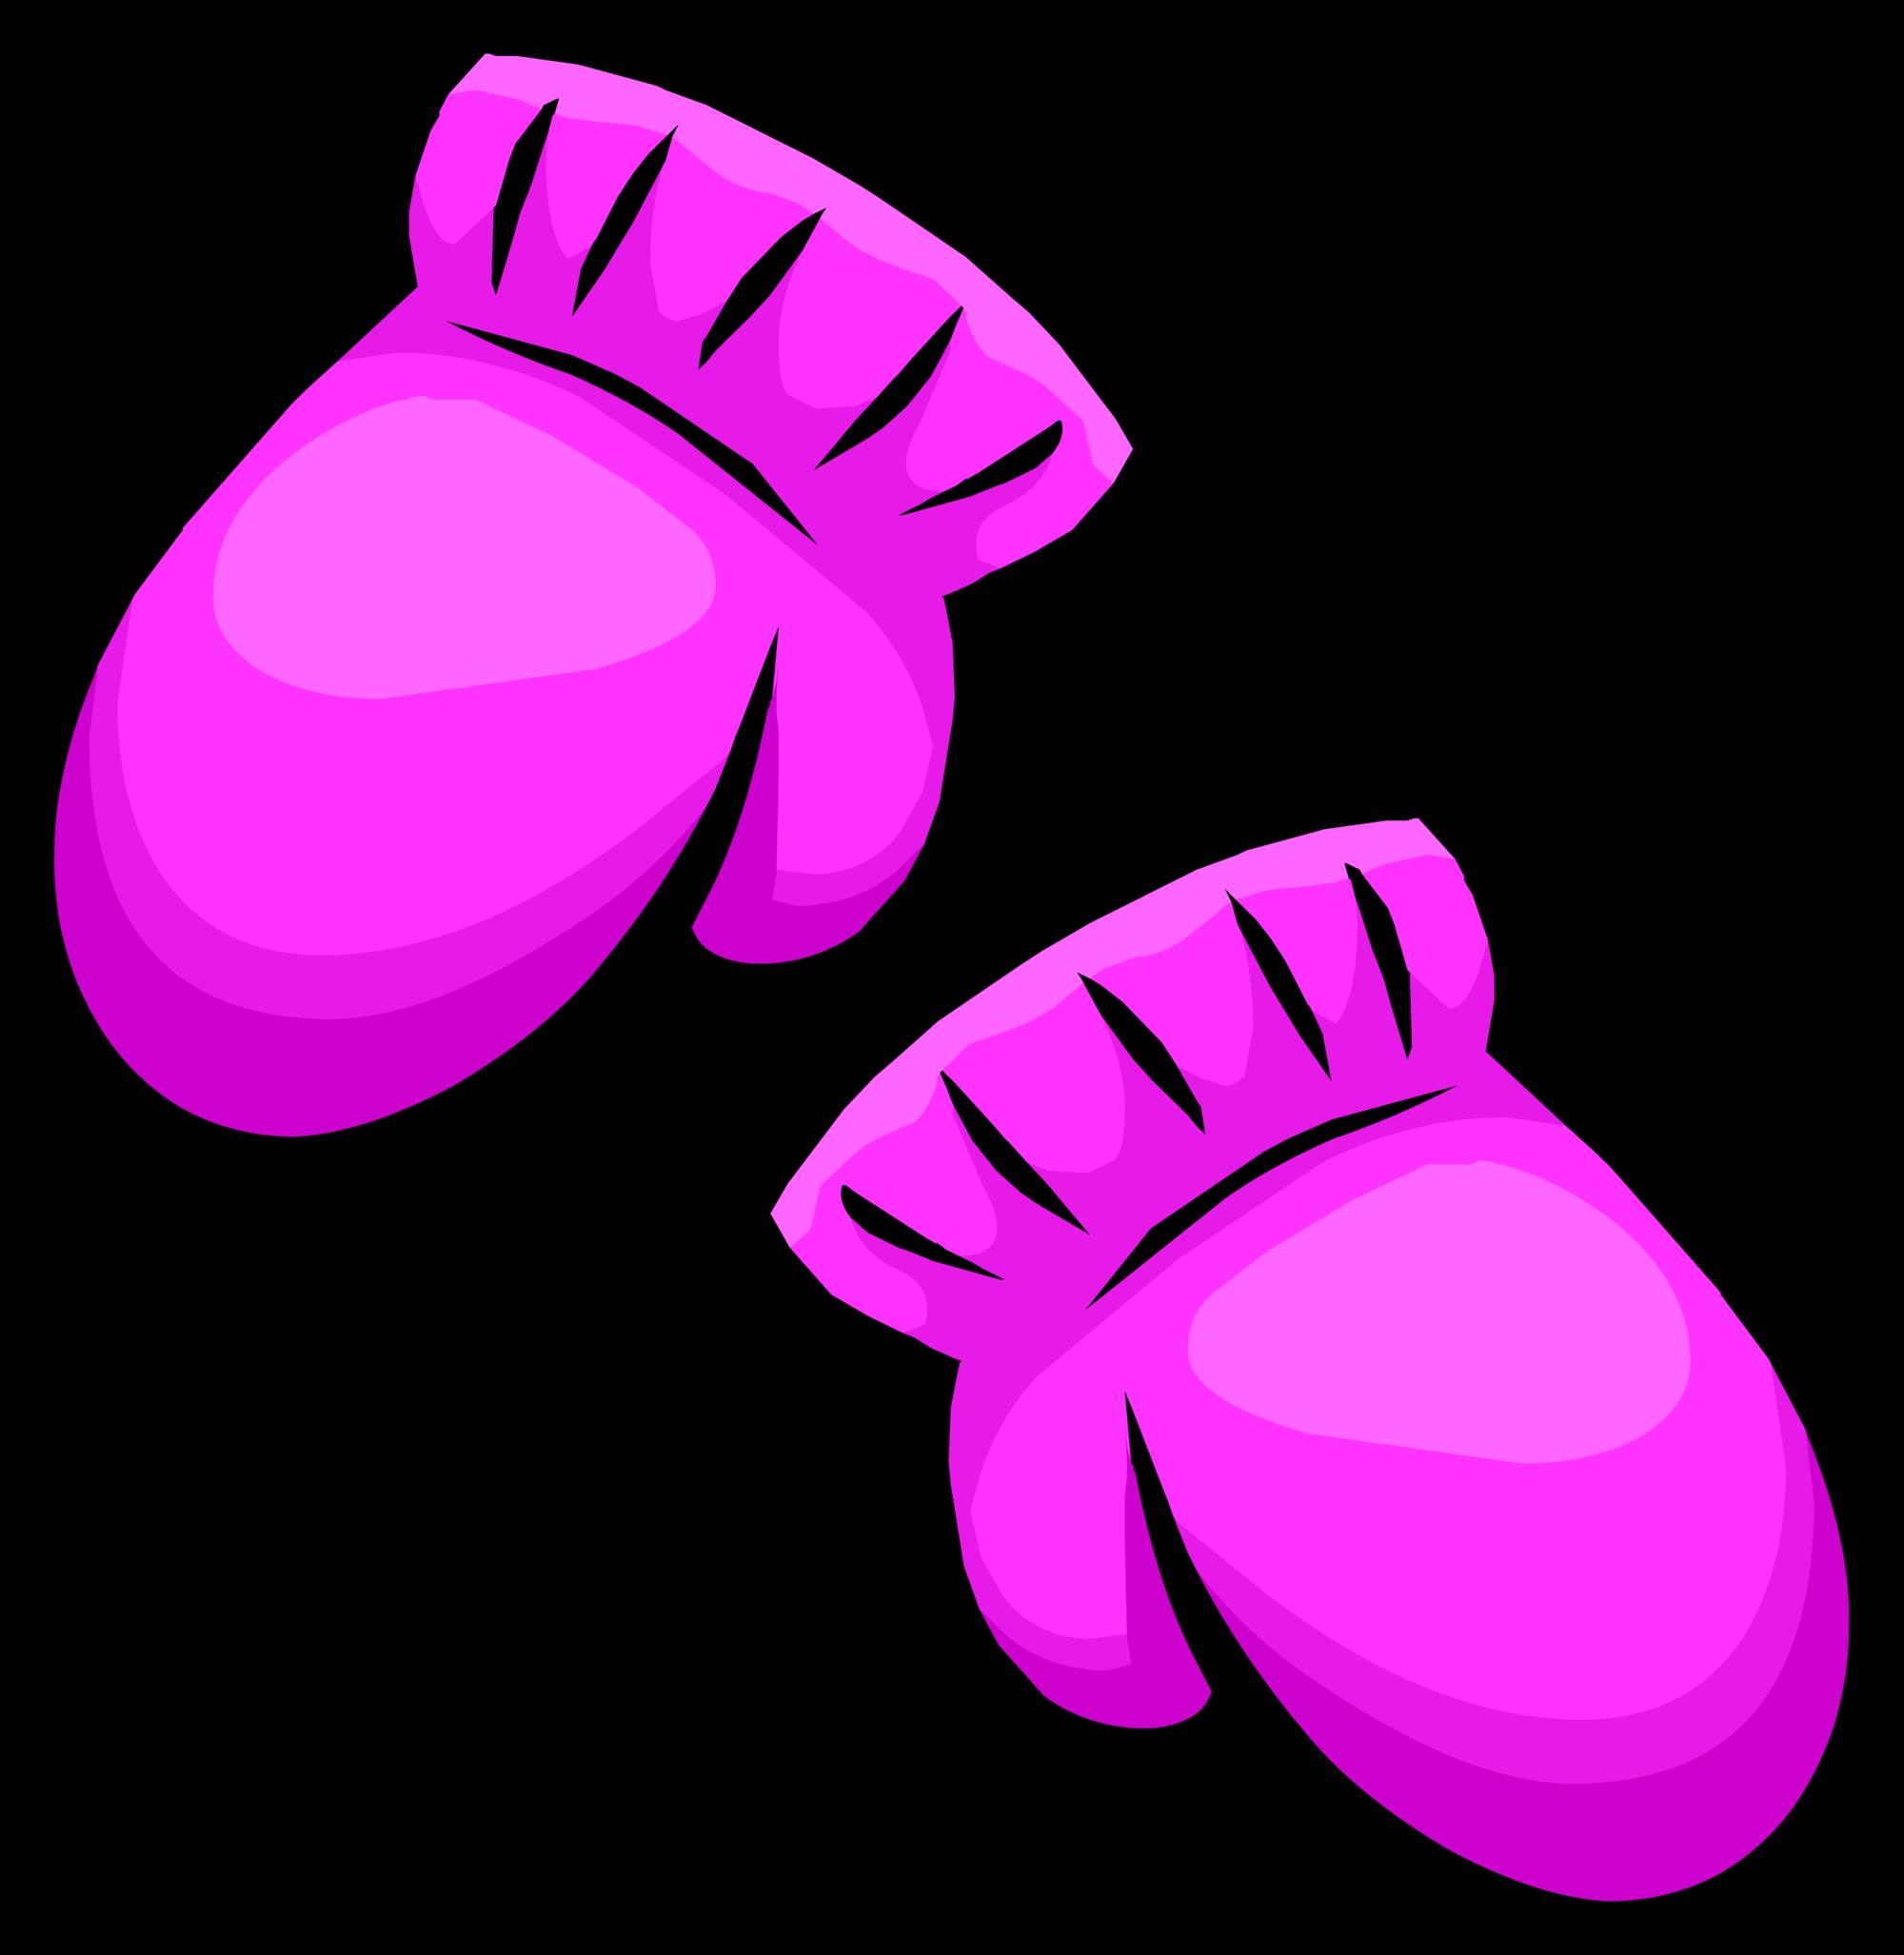 Mittens clipart purple. Pink club penguin wiki